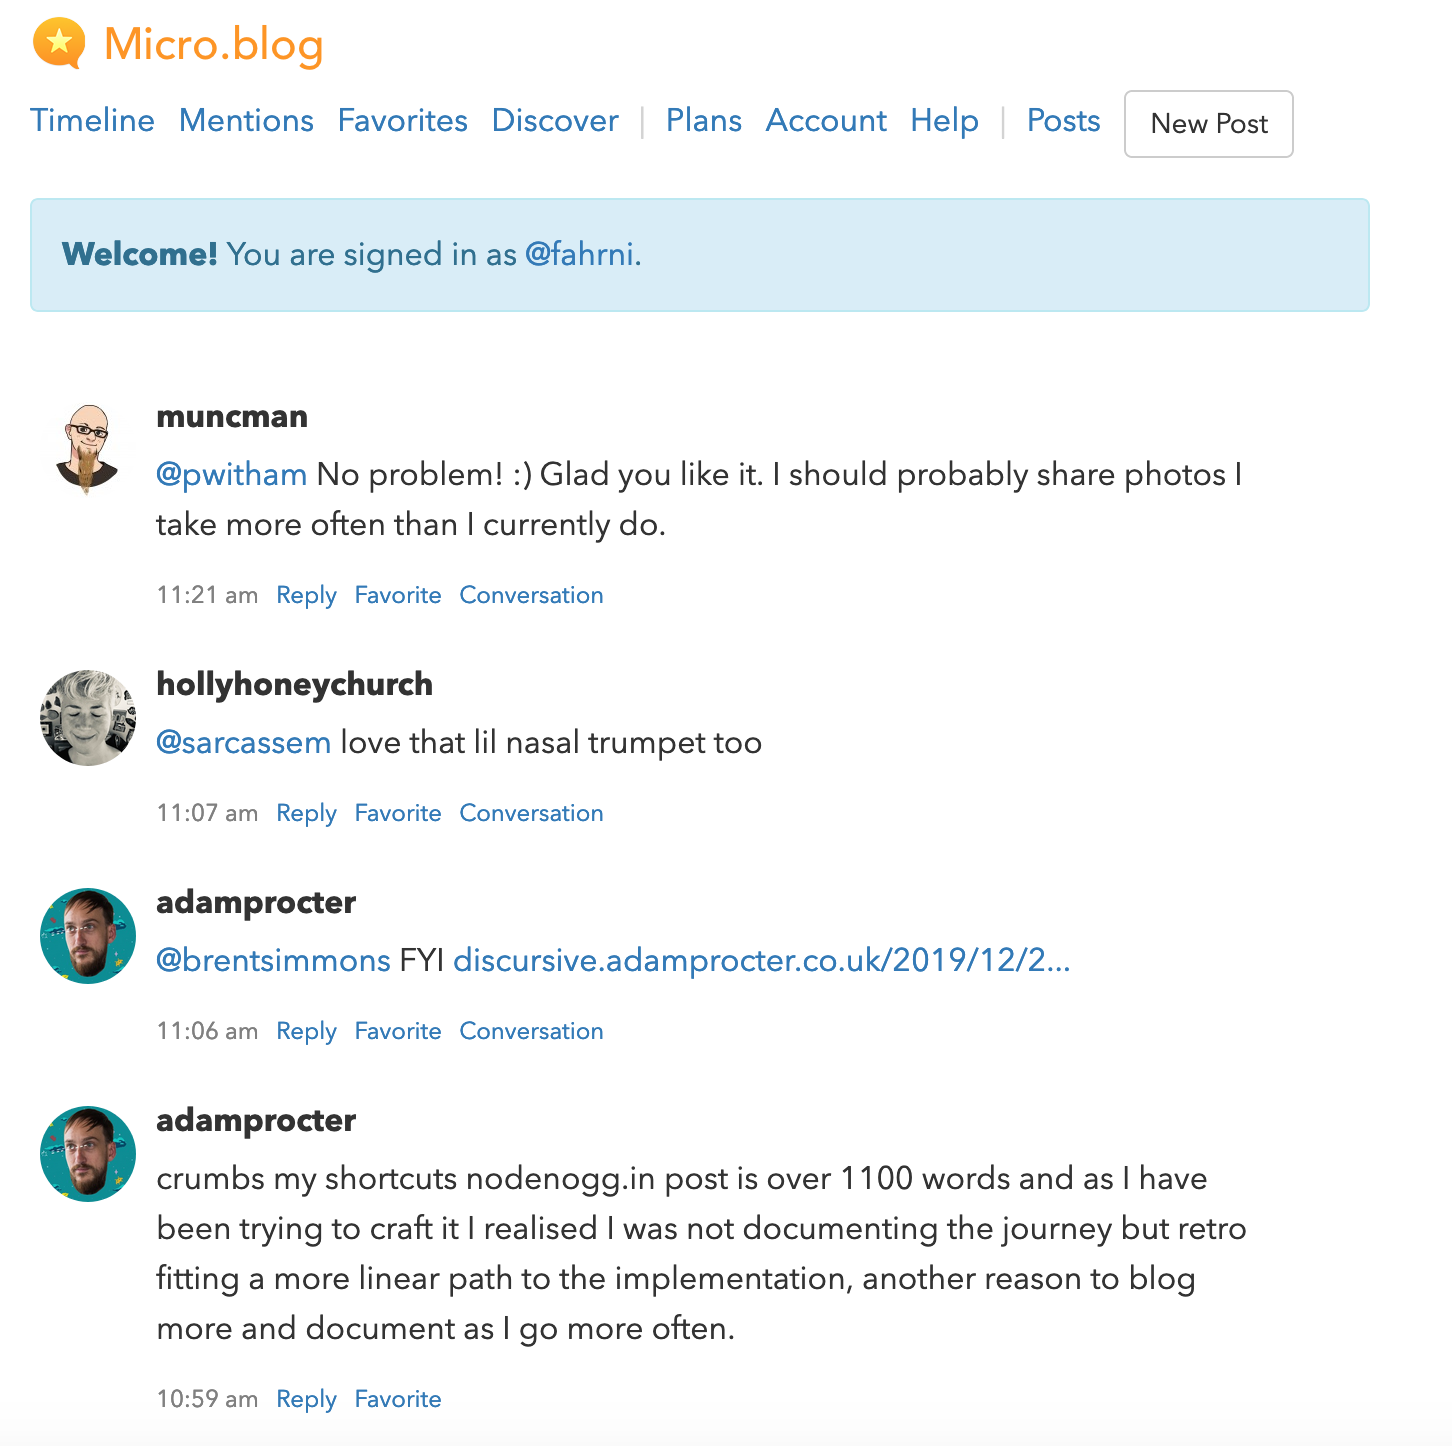 Micro.blog Timeline